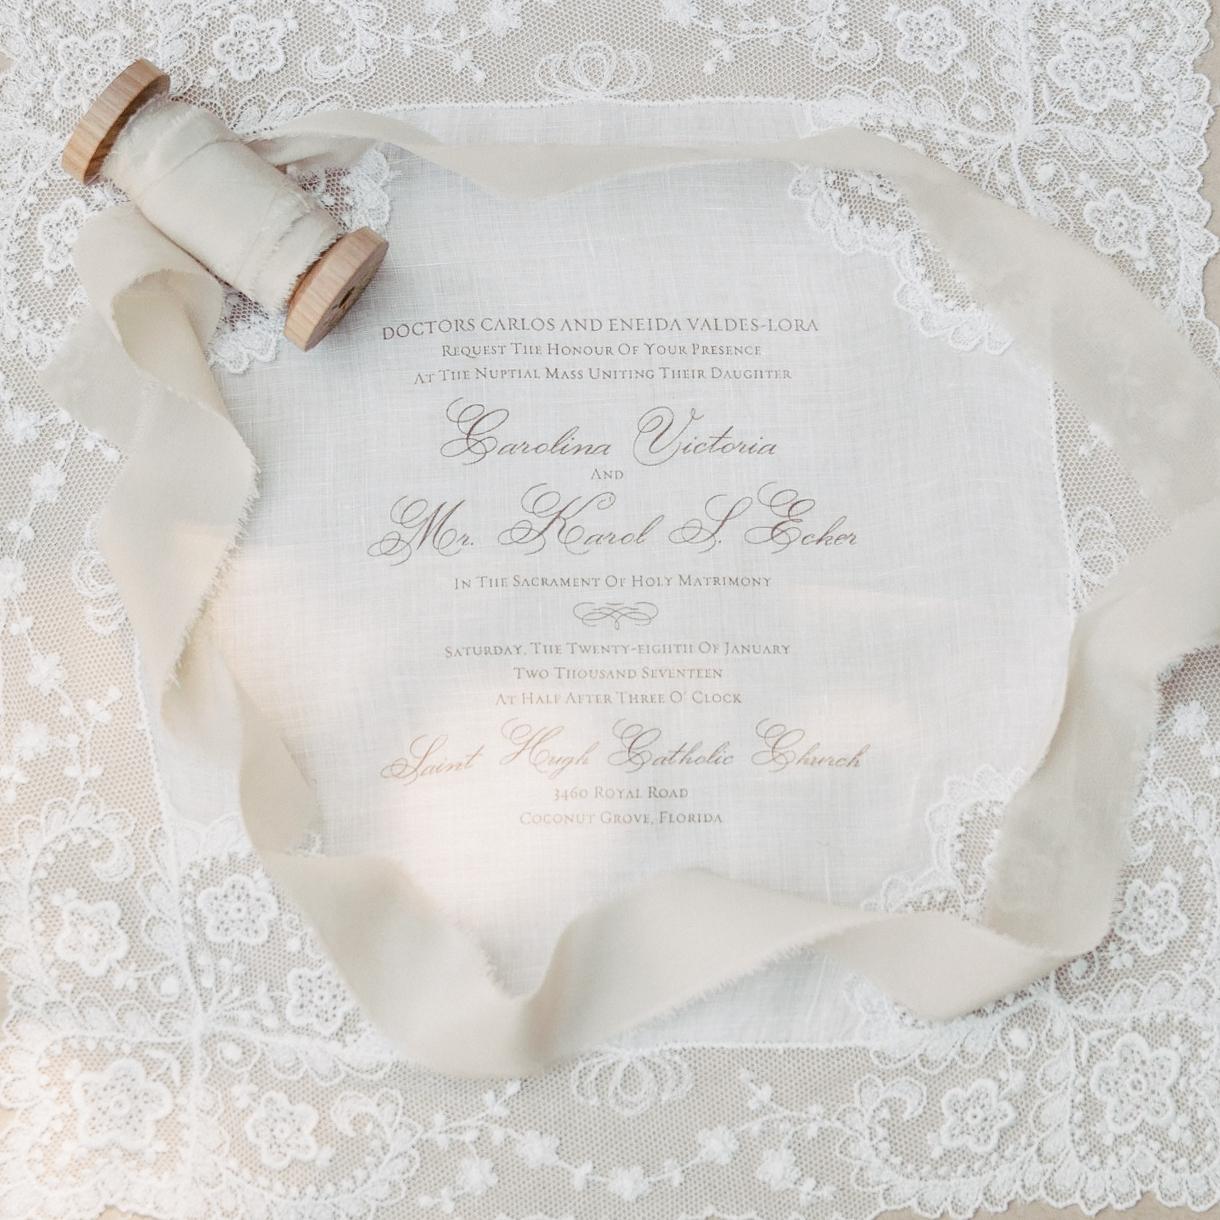 Carolina hand designed her wedding invites